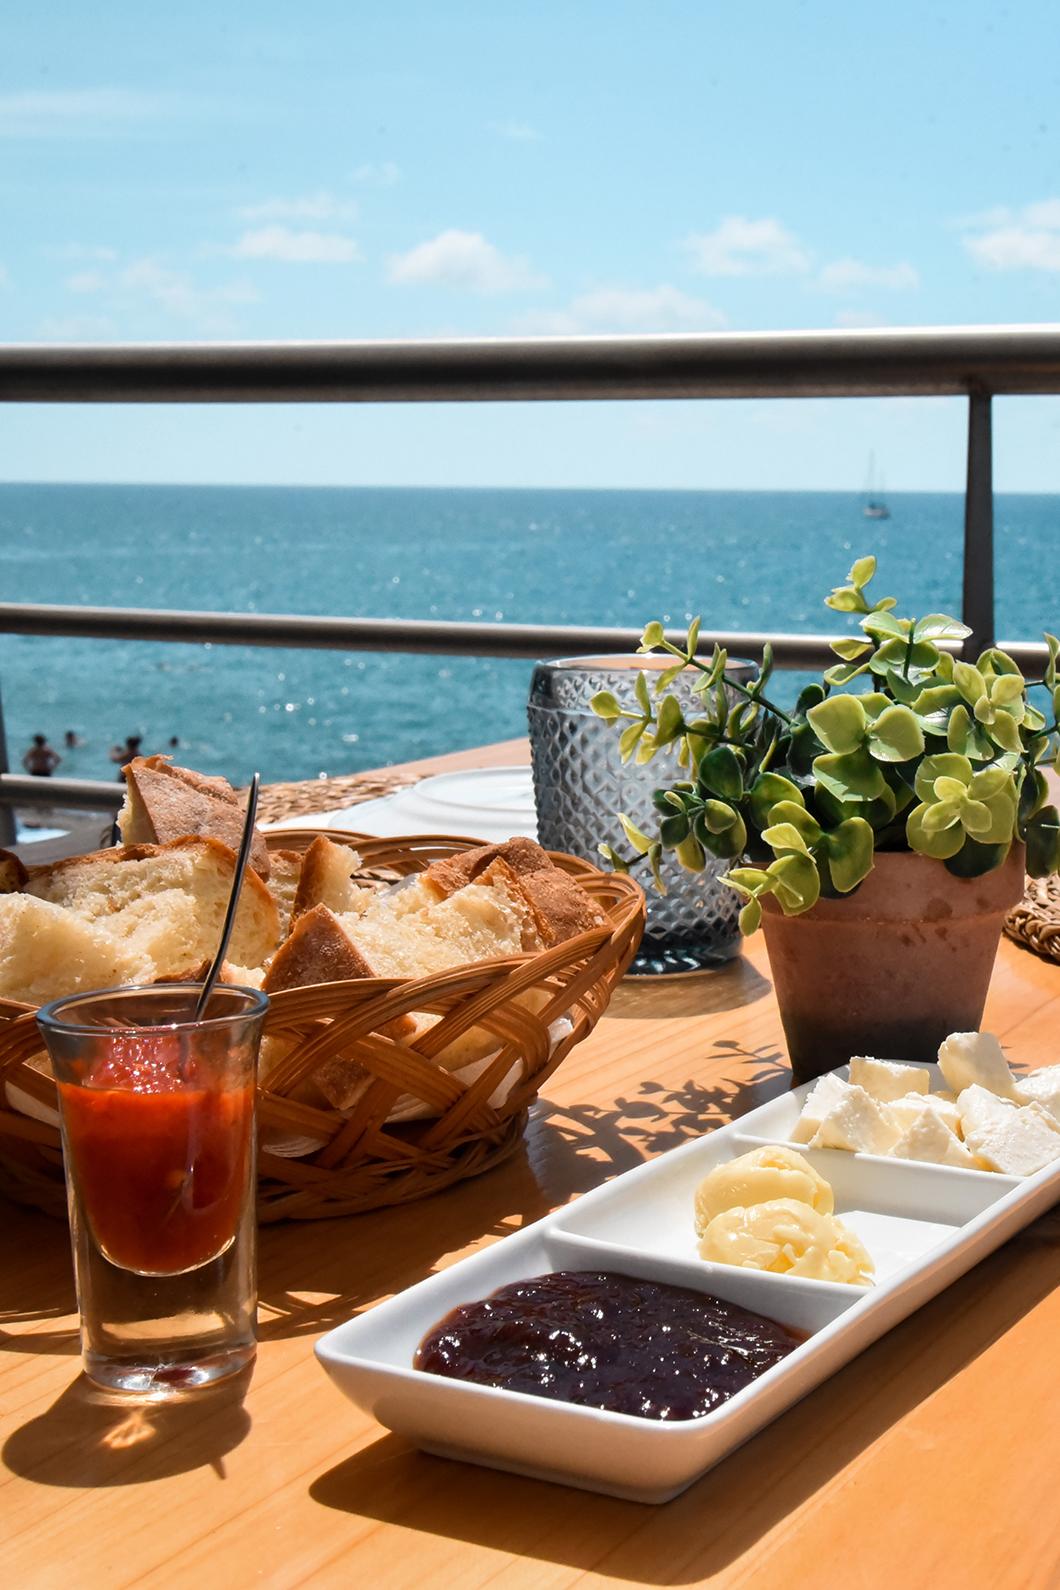 Meilleurs restaurants à Vila Franca do Campo, le AV VA Praia Café